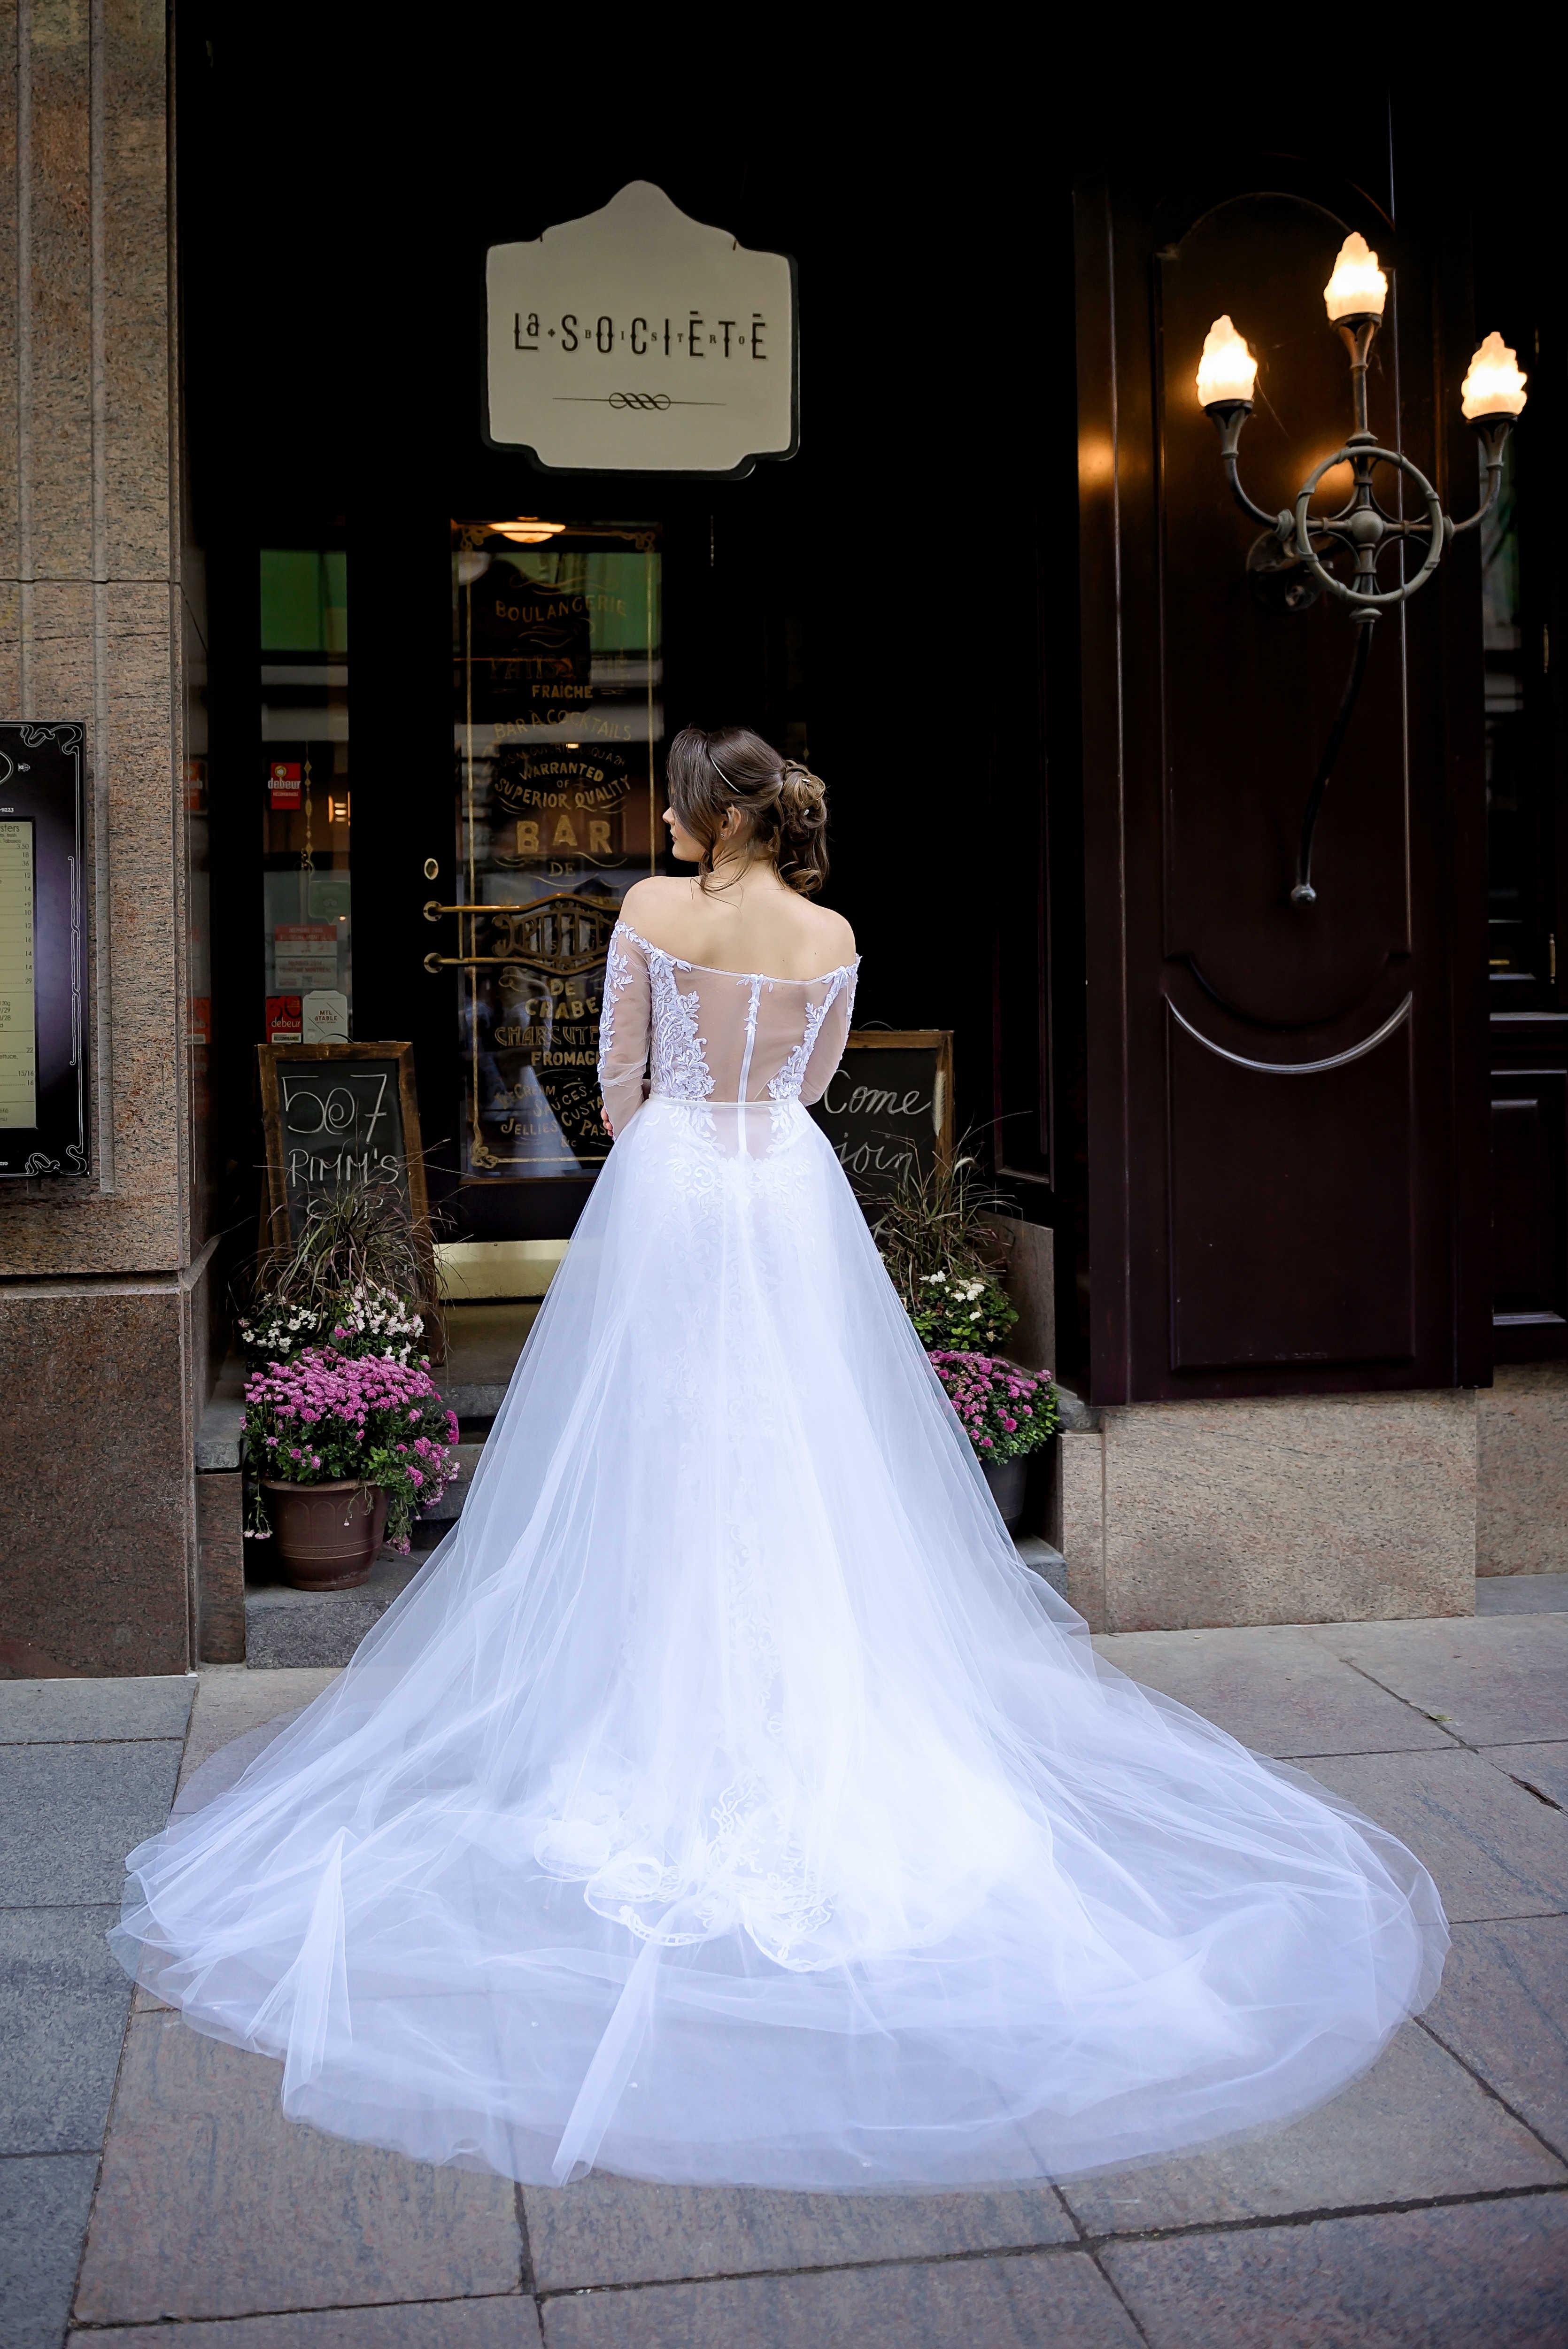 jupe en tulle et dos denude robe de mariee en dentelle robes haute gamme montreal